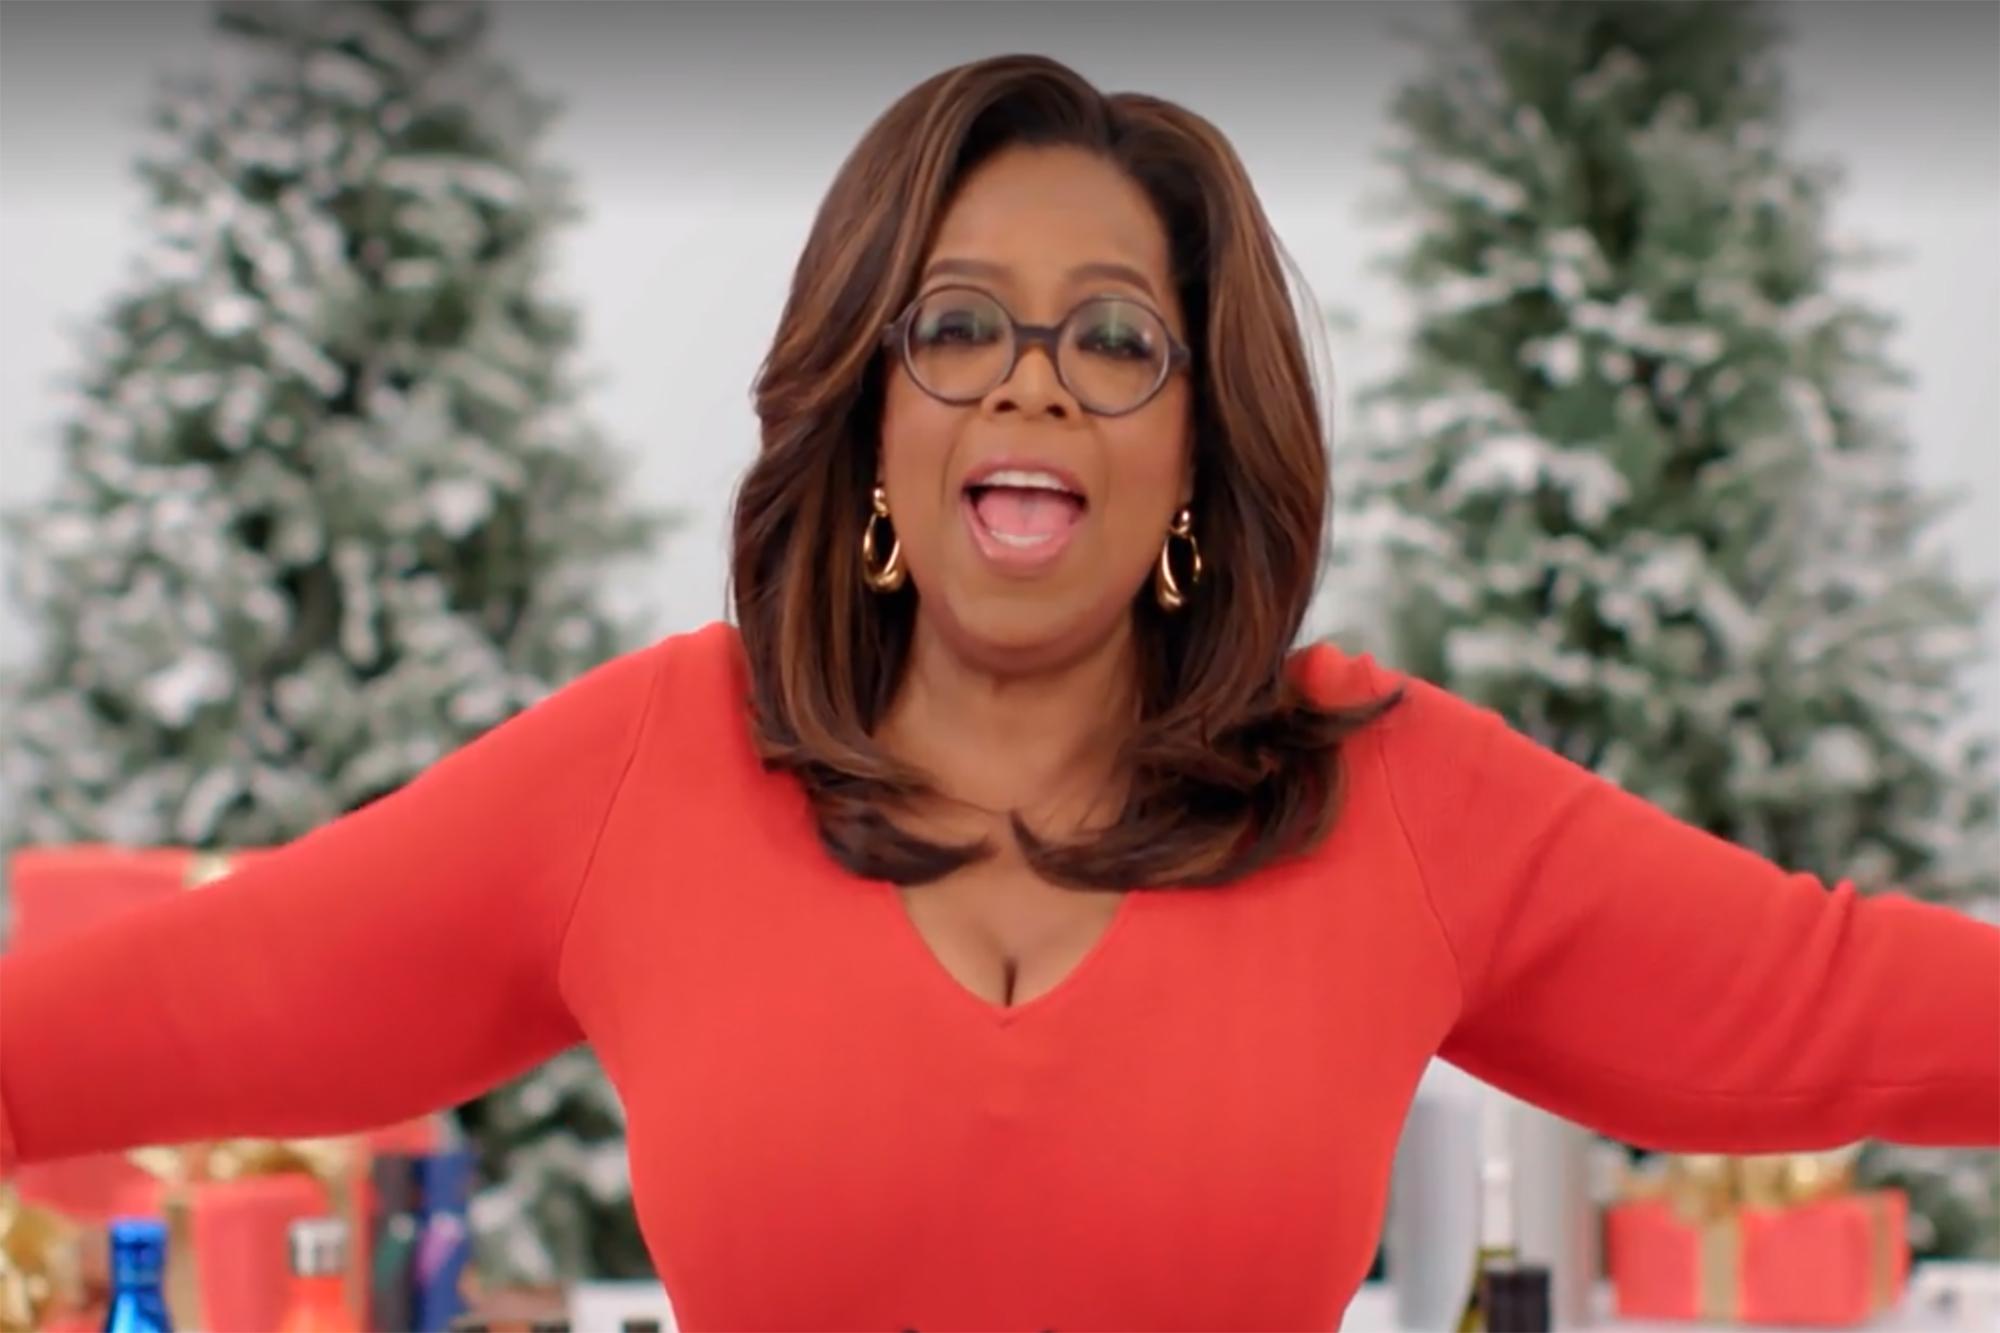 Oprahs 2021 Christmas Gifts Oprah Winfrey S 2019 Favorite Things List Has Arrived